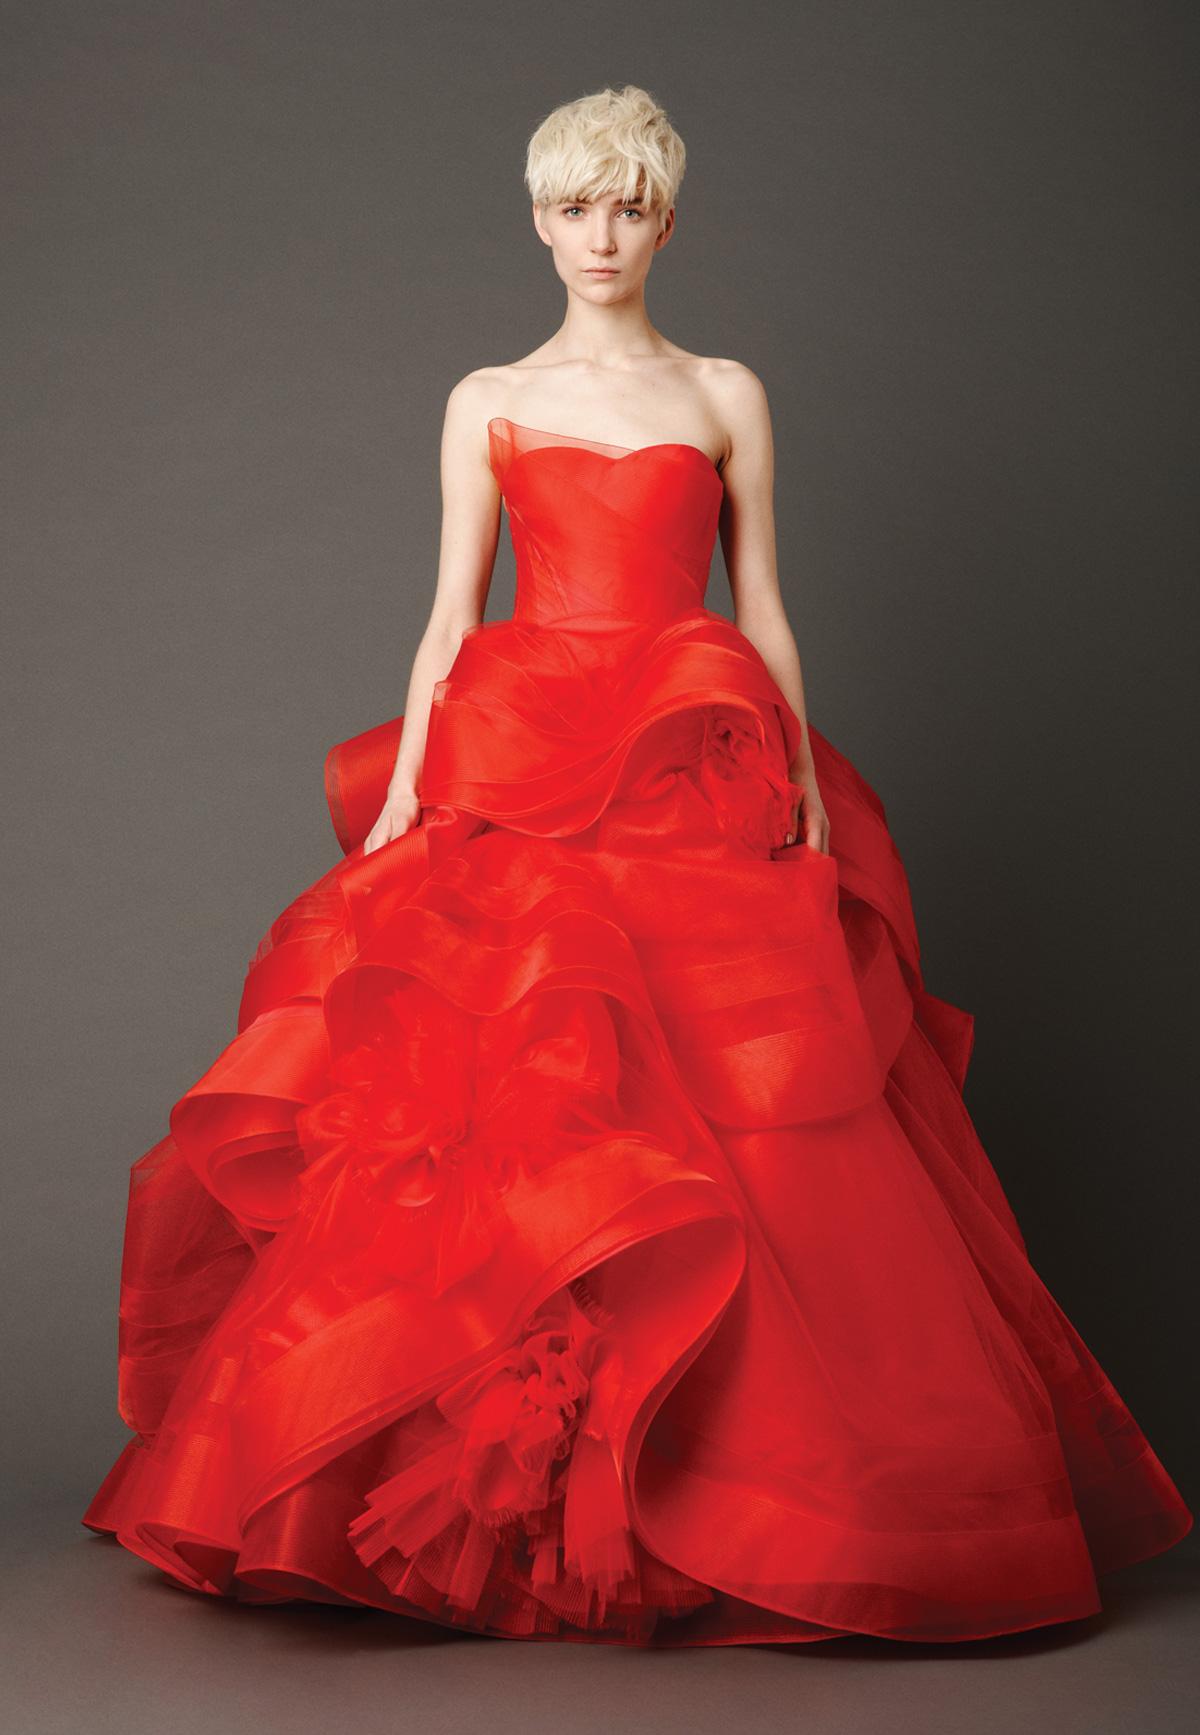 red wedding dresses red wedding dresses Vera Wang Red Wedding Dress